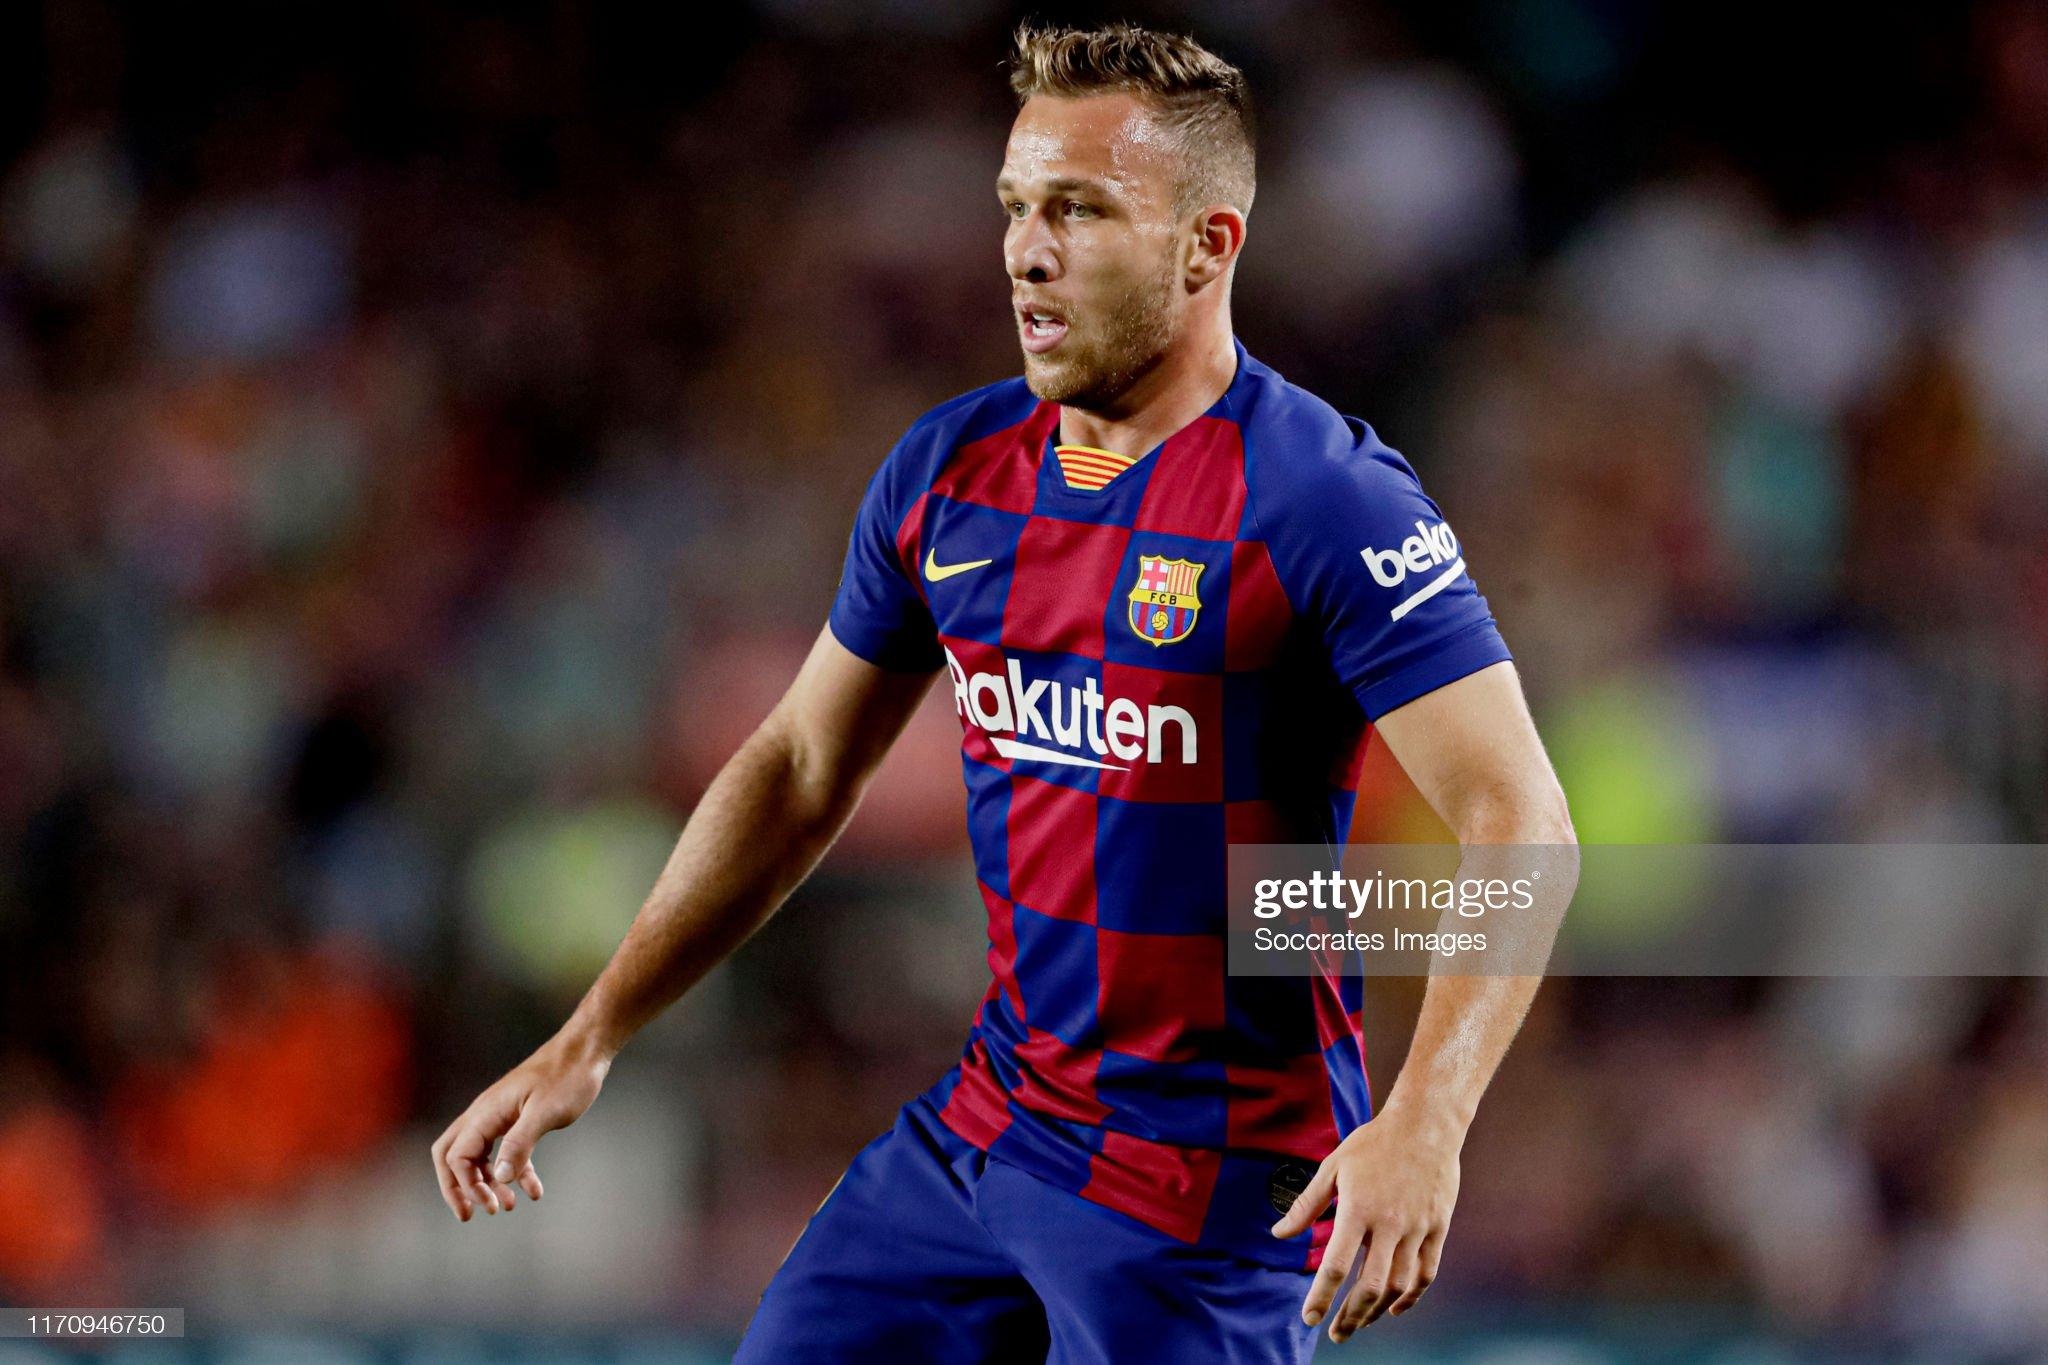 صور مباراة : برشلونة - فياريال 2-1 ( 24-09-2019 )  Arthur-of-fc-barcelona-during-the-la-liga-santander-match-between-fc-picture-id1170946750?s=2048x2048